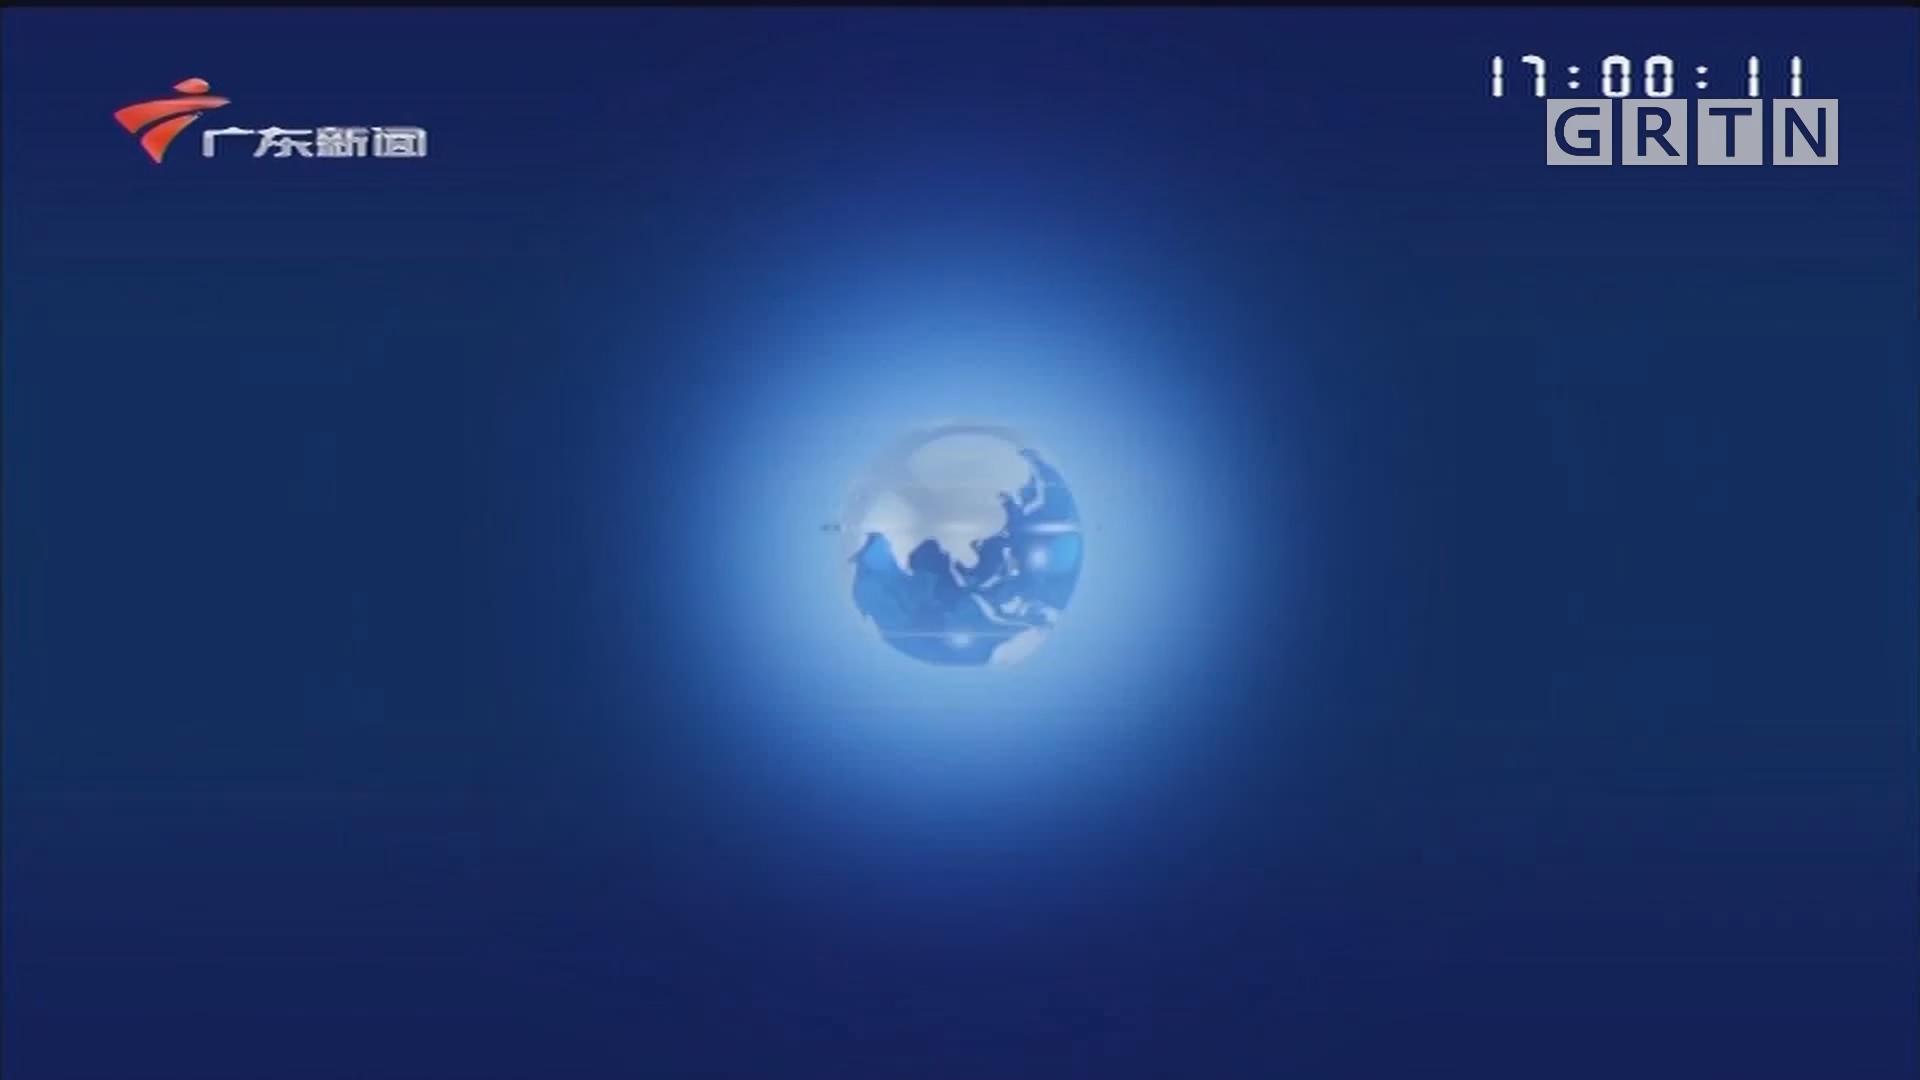 [HD][2020-01-24-17:00]正点播报:肇庆 年三十 家家户户准备团圆饭